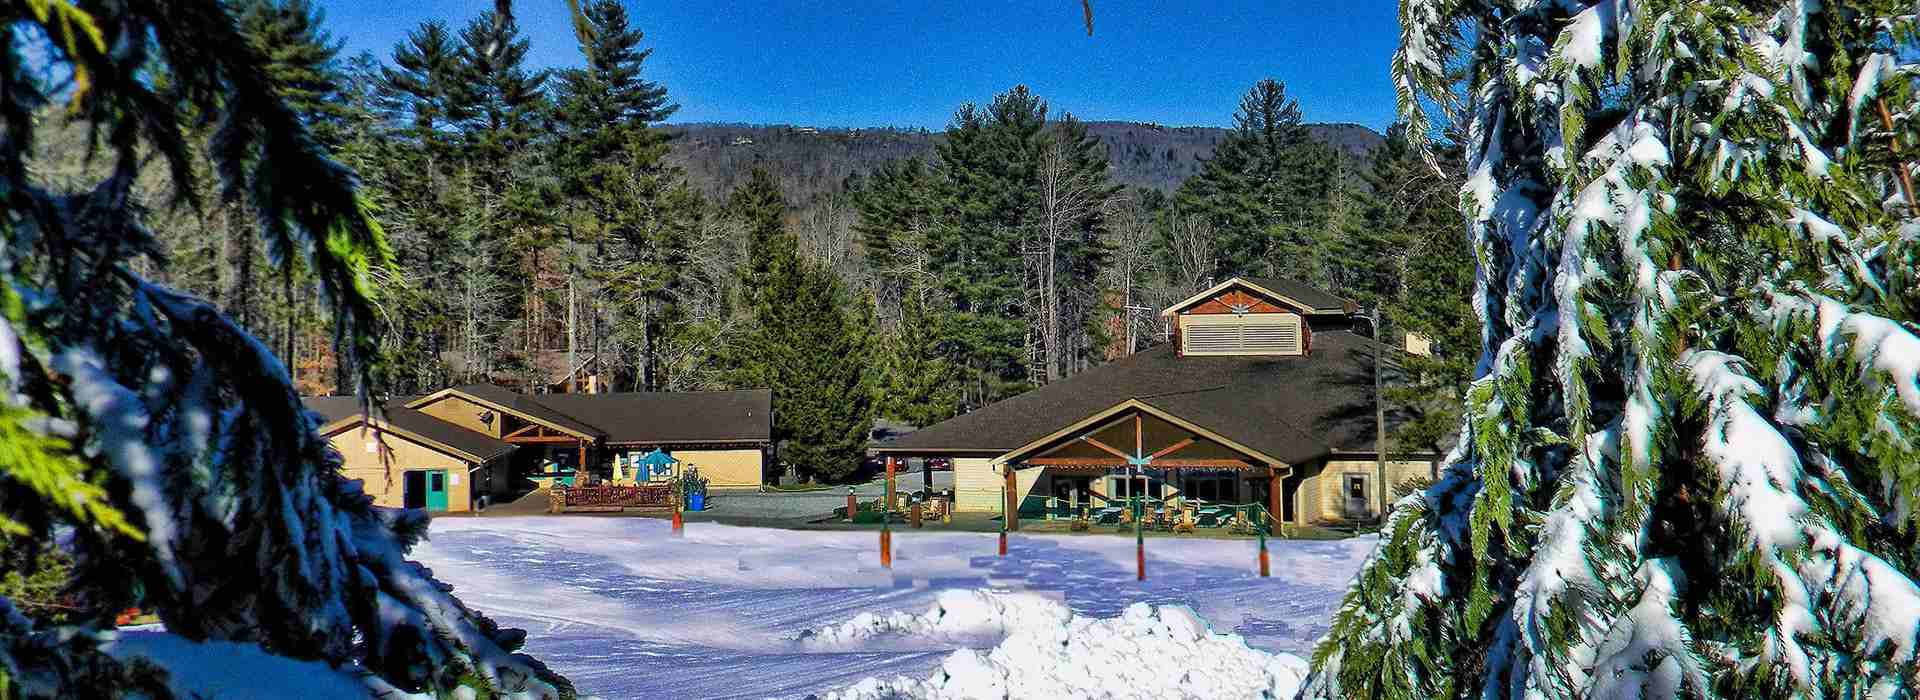 Sapphire Valley Ski Resort